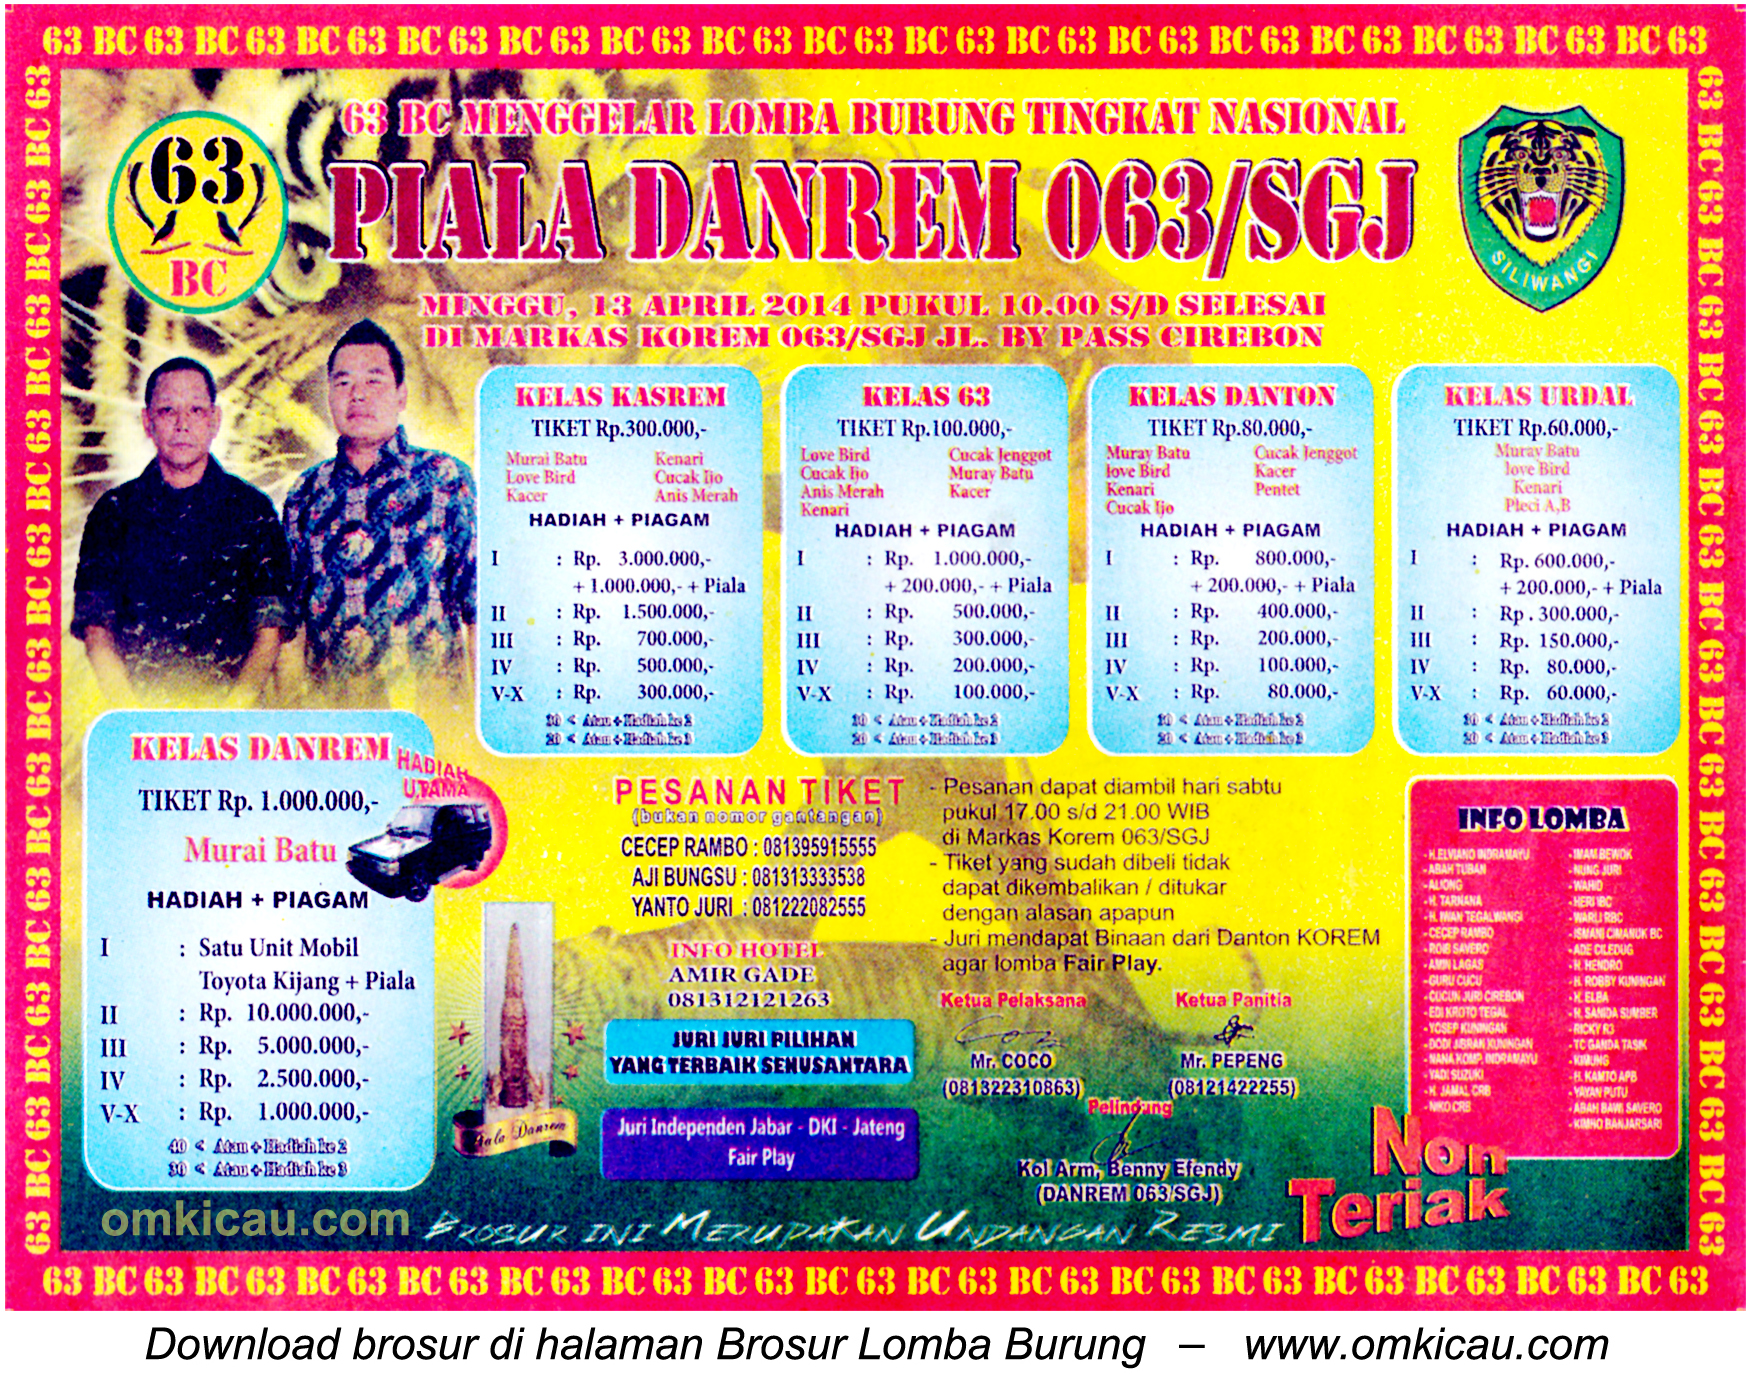 Brosur Lomba Burung Berkicau Piala Danrem 063 SGJ, Cirebon, 13 April 2014